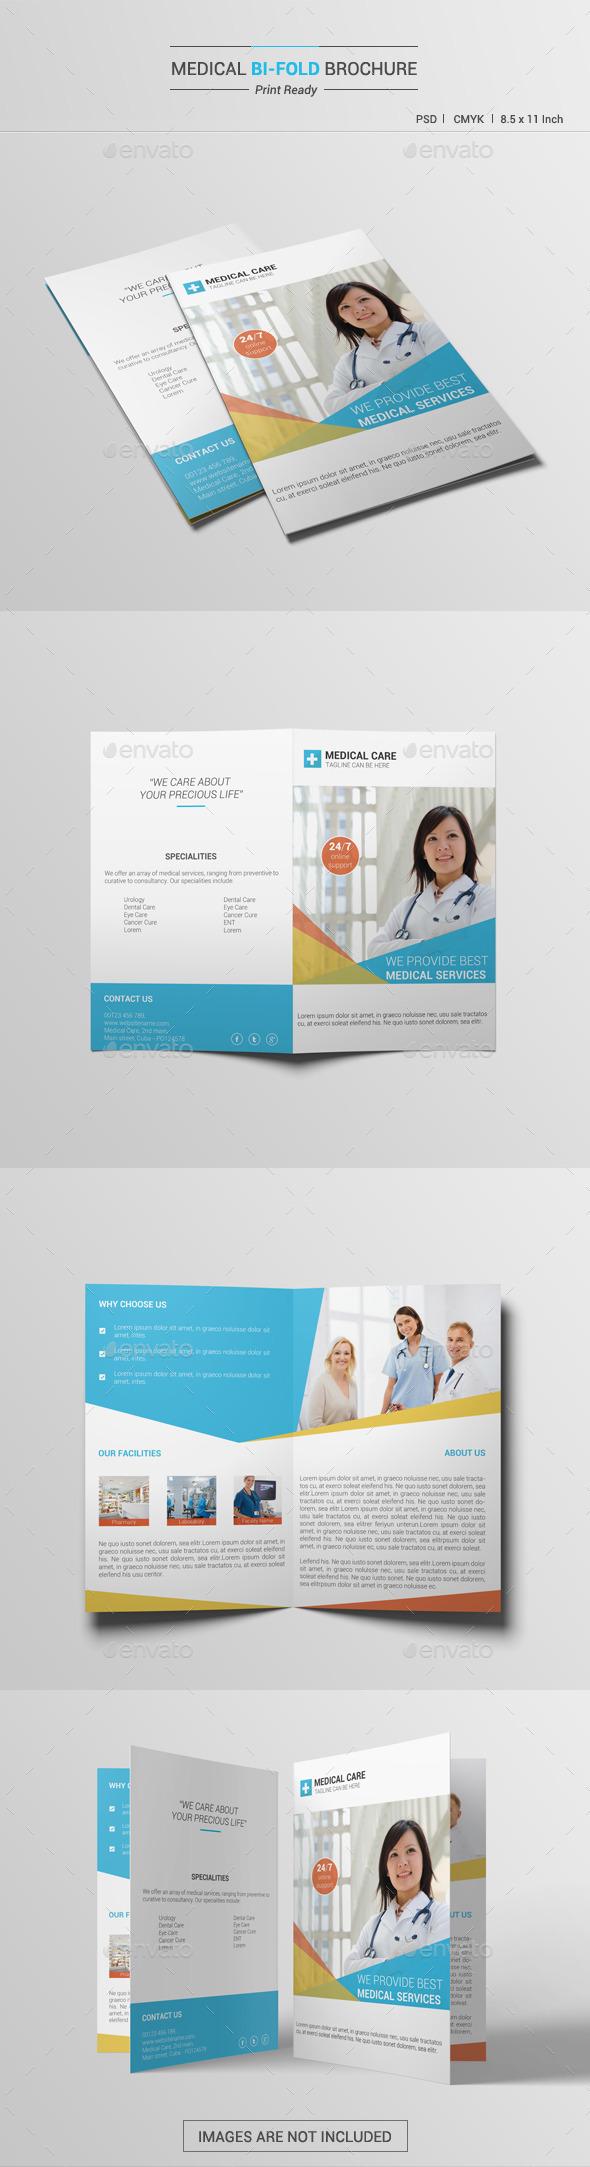 Medical Bi-Fold Brochure V1 - Brochures Print Templates